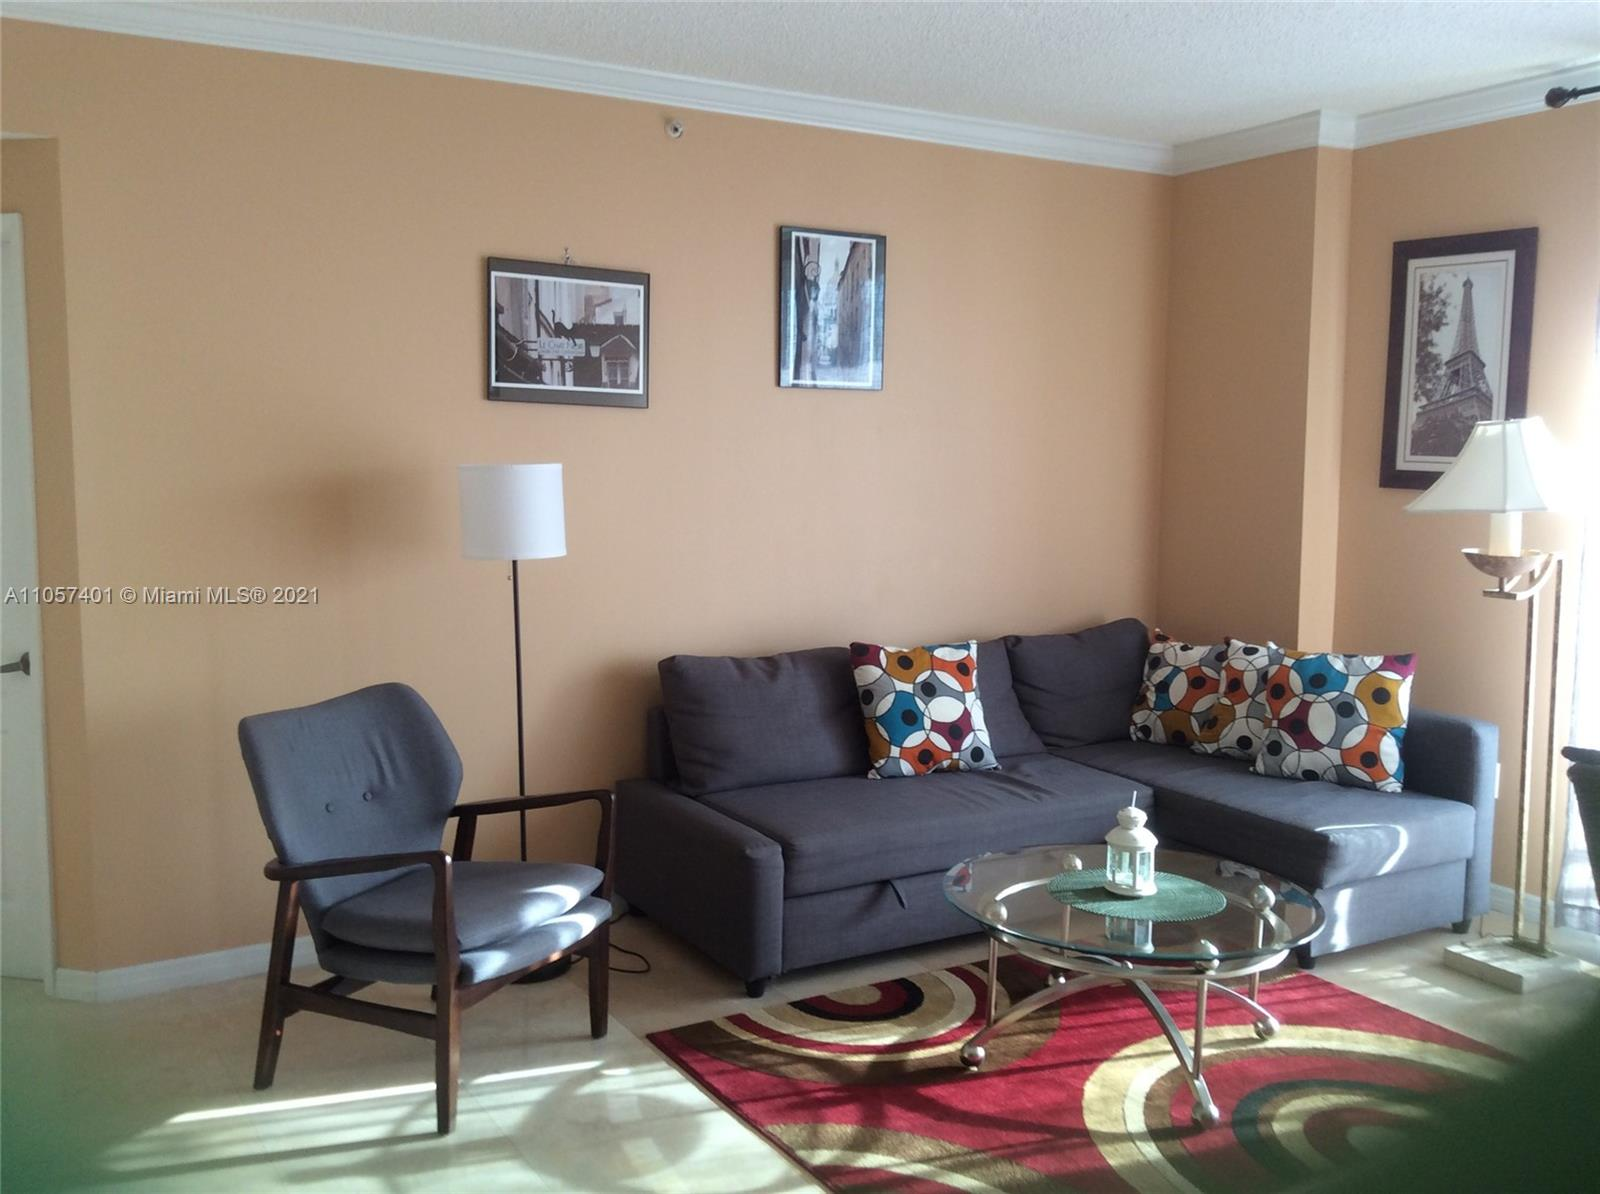 Photo of King David Condominiums Apt PH6